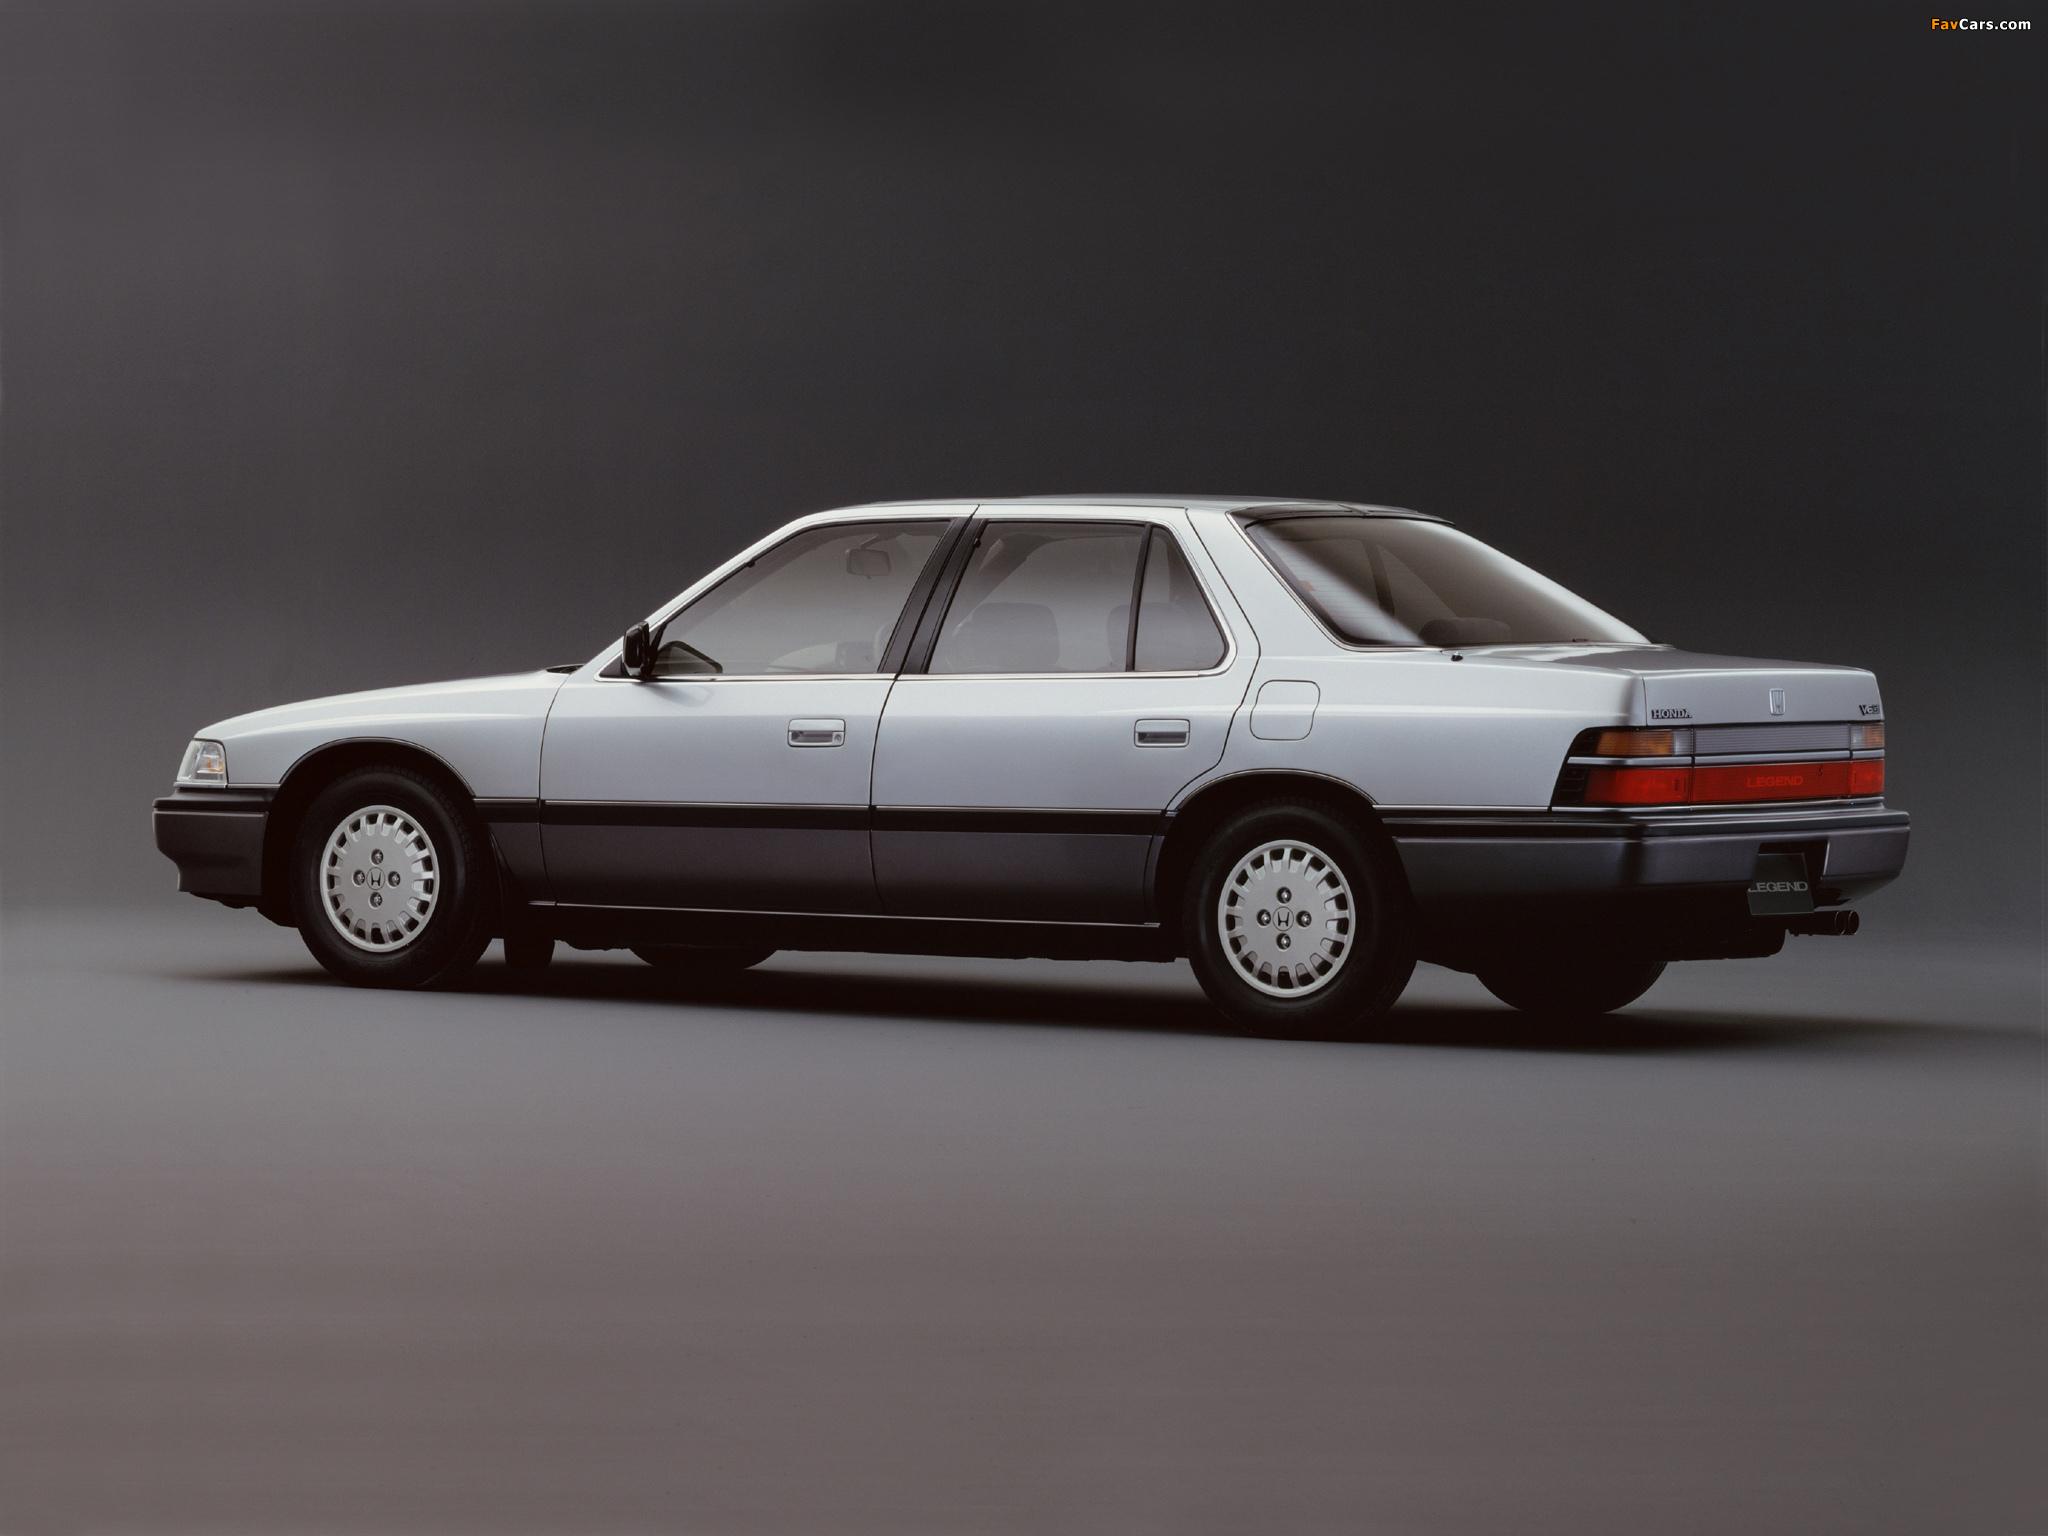 Pictures of Honda Legend V6 Gi 1985-90 (2048x1536)